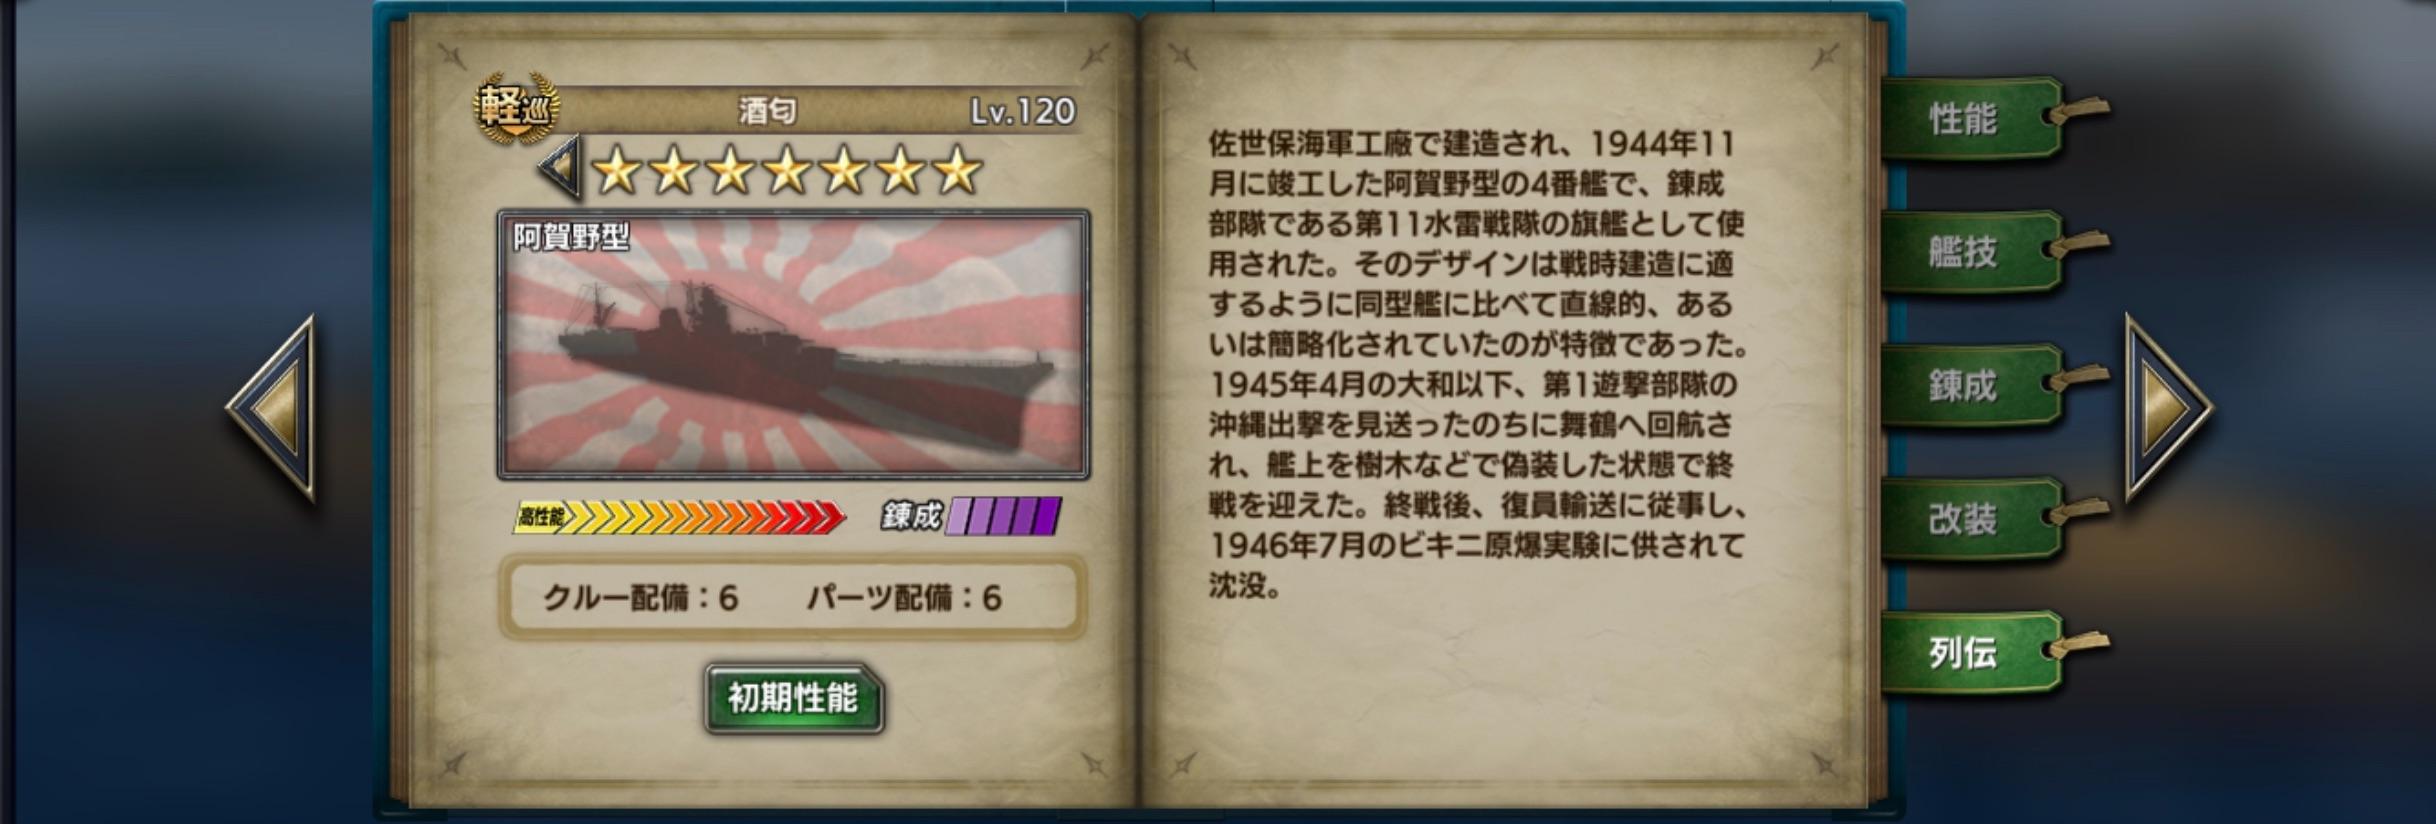 Sakawa-history